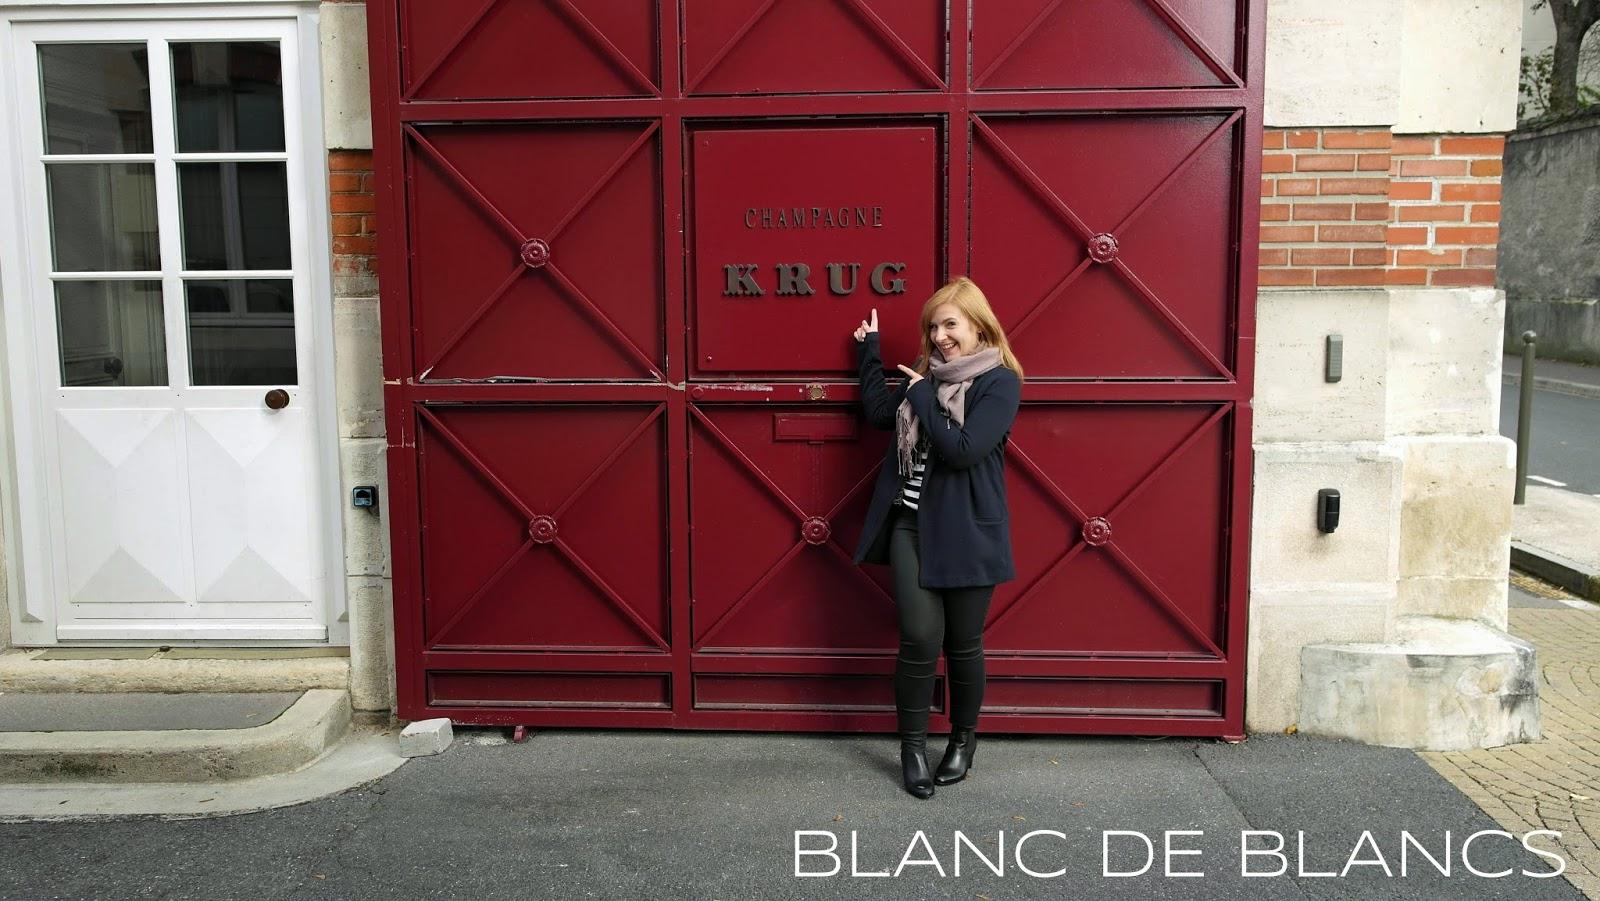 Krug lover - www.blancdeblancs.fi